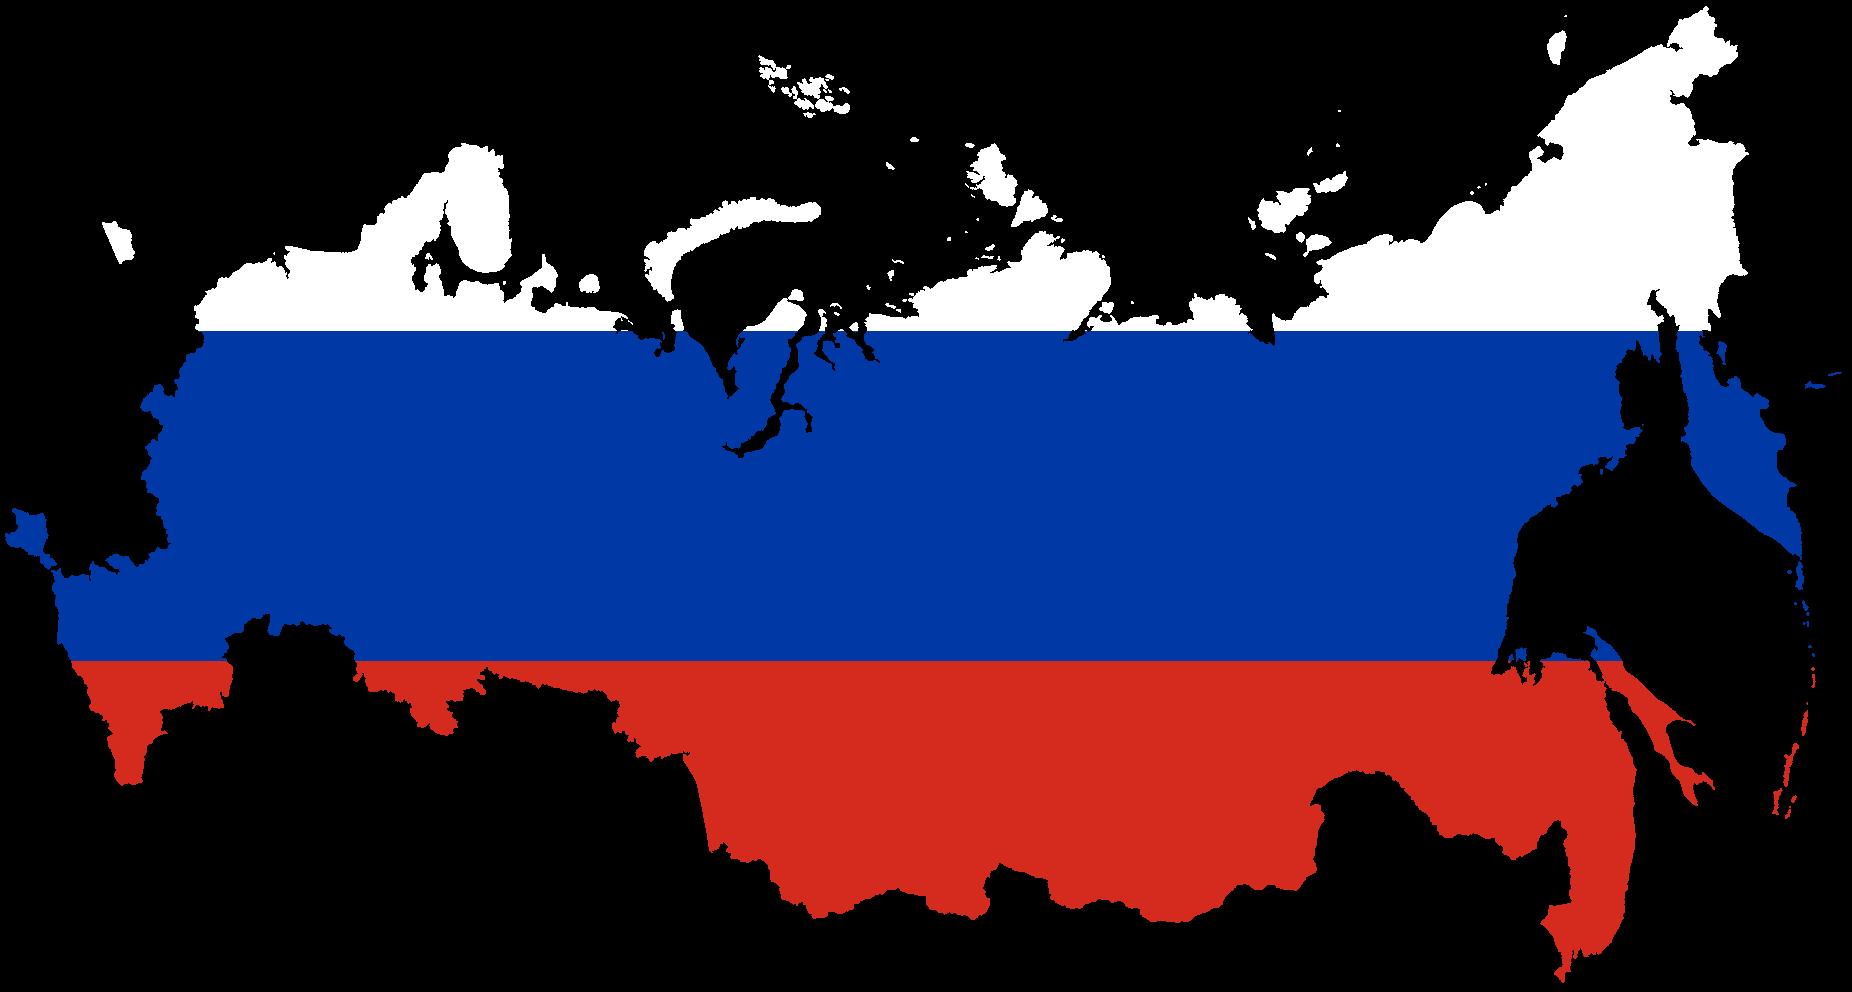 Image flag map of russian federationg gta wiki fandom flag map of russian federationg gumiabroncs Choice Image